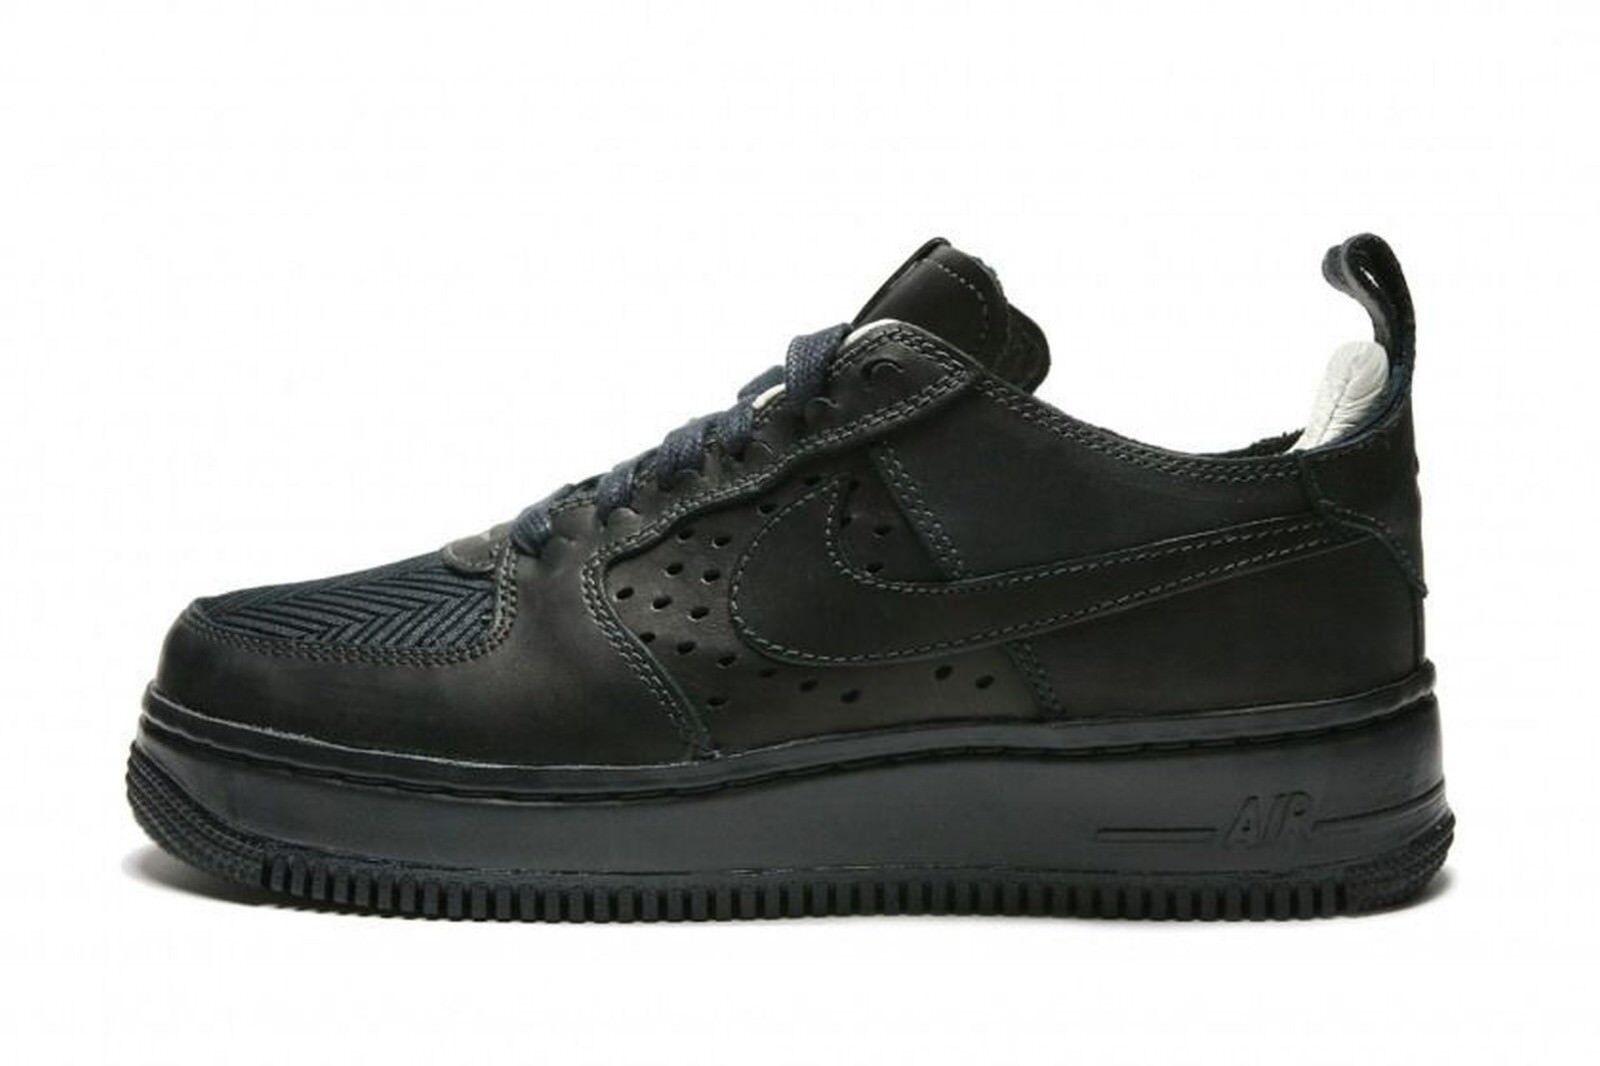 NIKE AIR FORCE 1 CMFT TC SP BLACK & SAIL Wmn Sz 8.5 Premium Leather